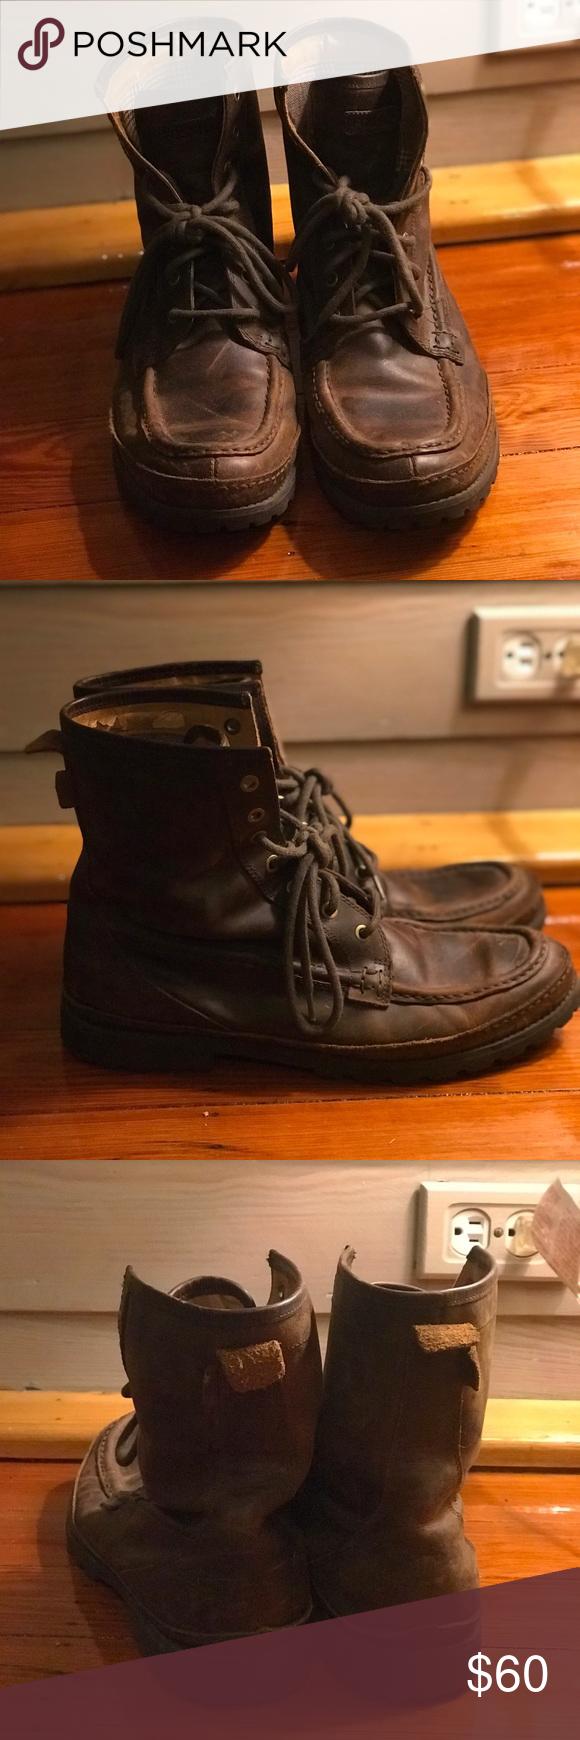 85a13483394 Fossil Welding Boots Fossil Welding boots. Heavy leather exterior ...